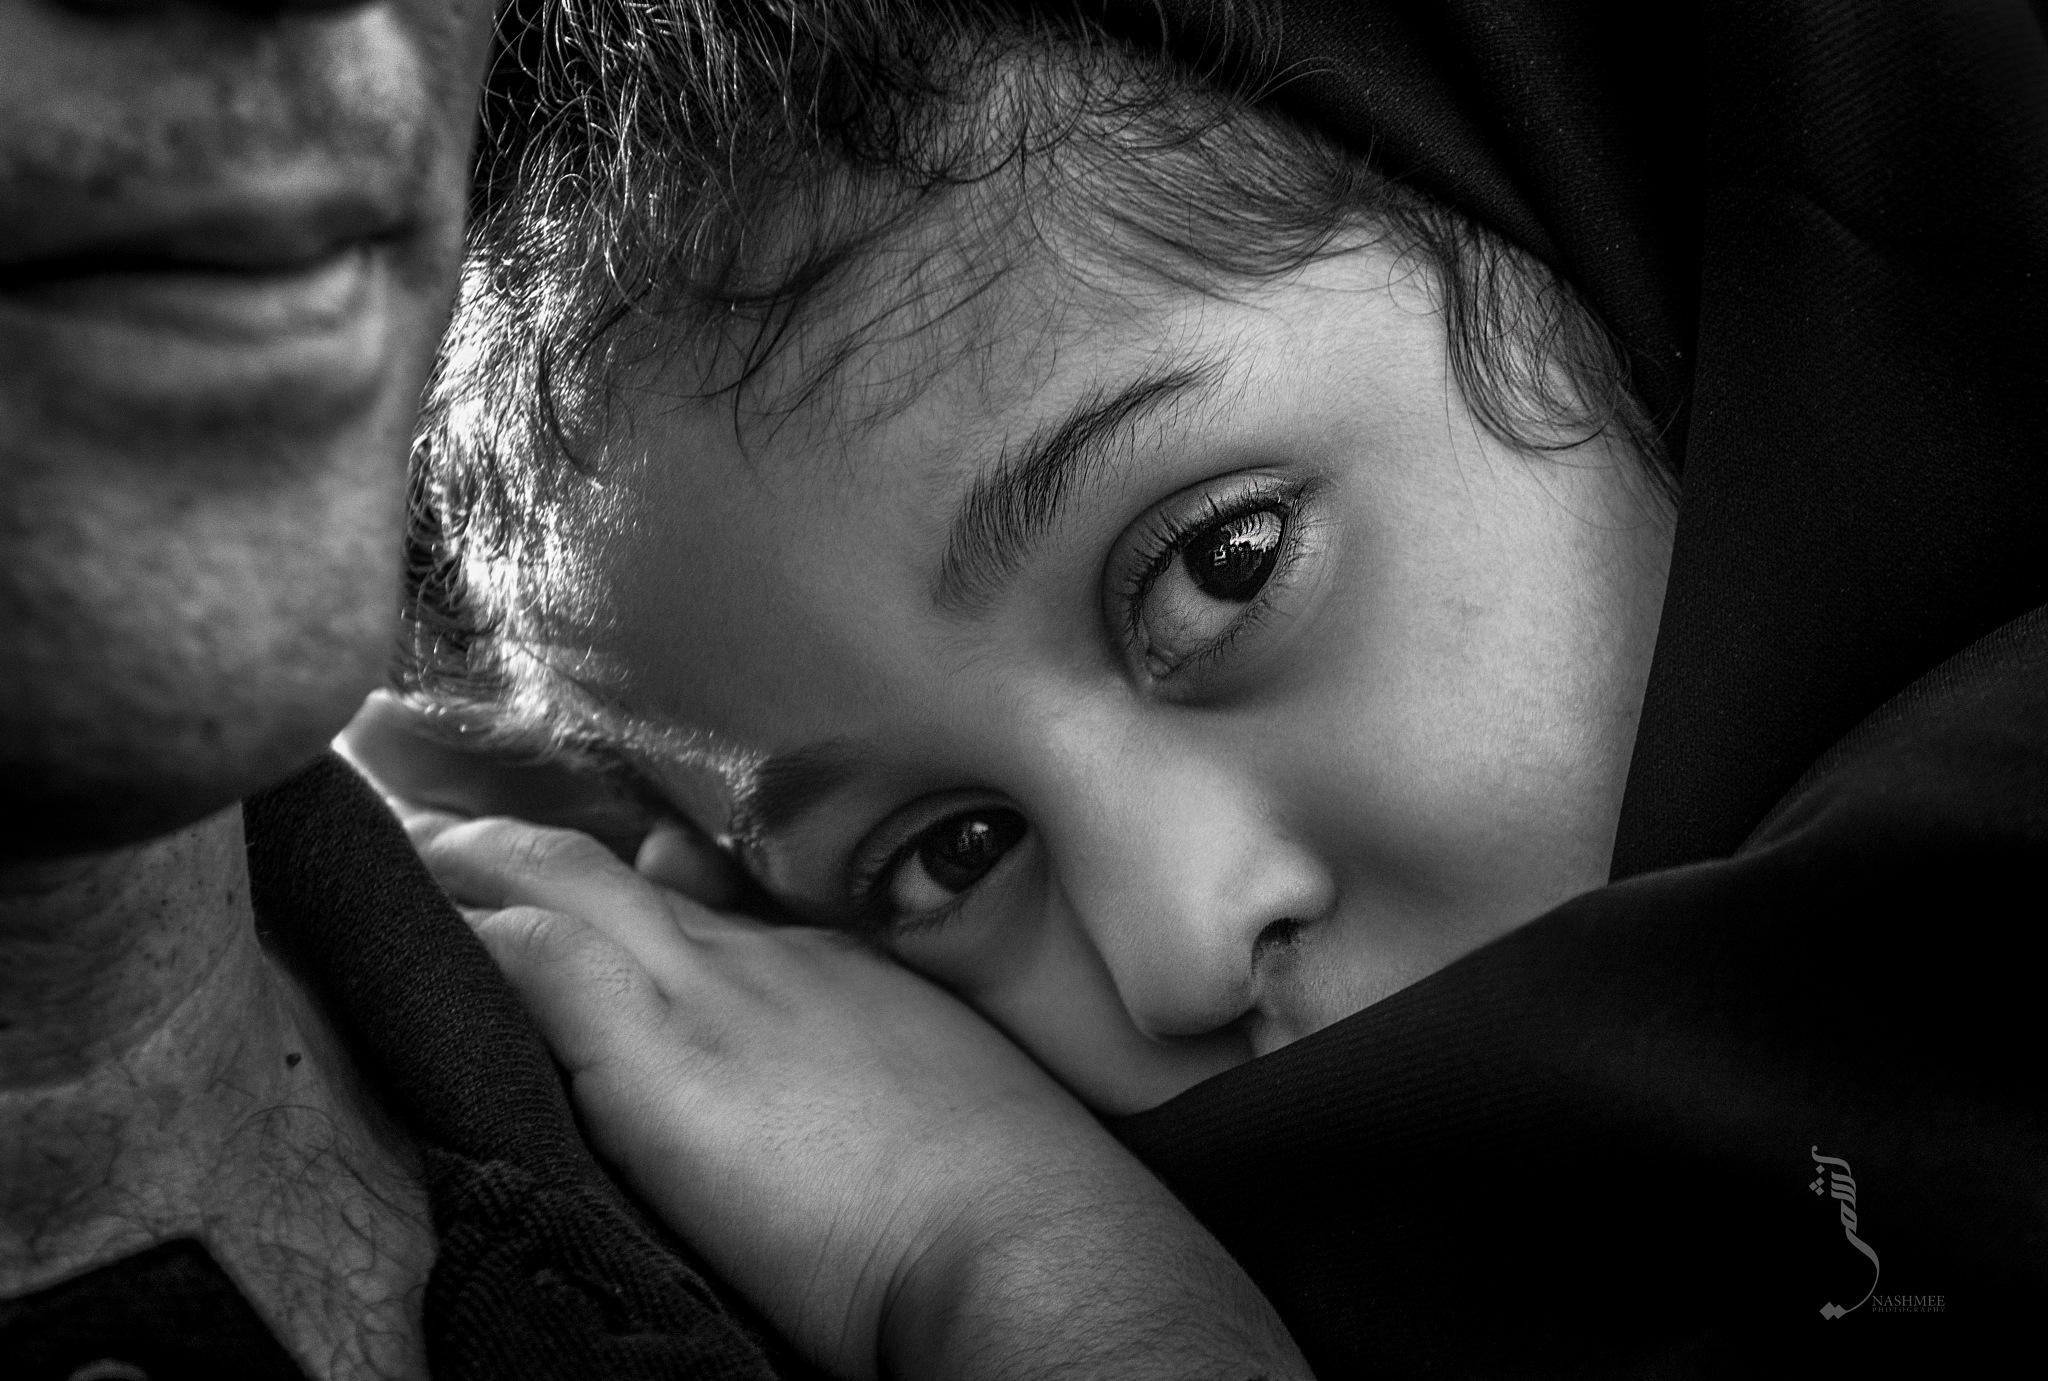 Eyes of innocence  by Ali